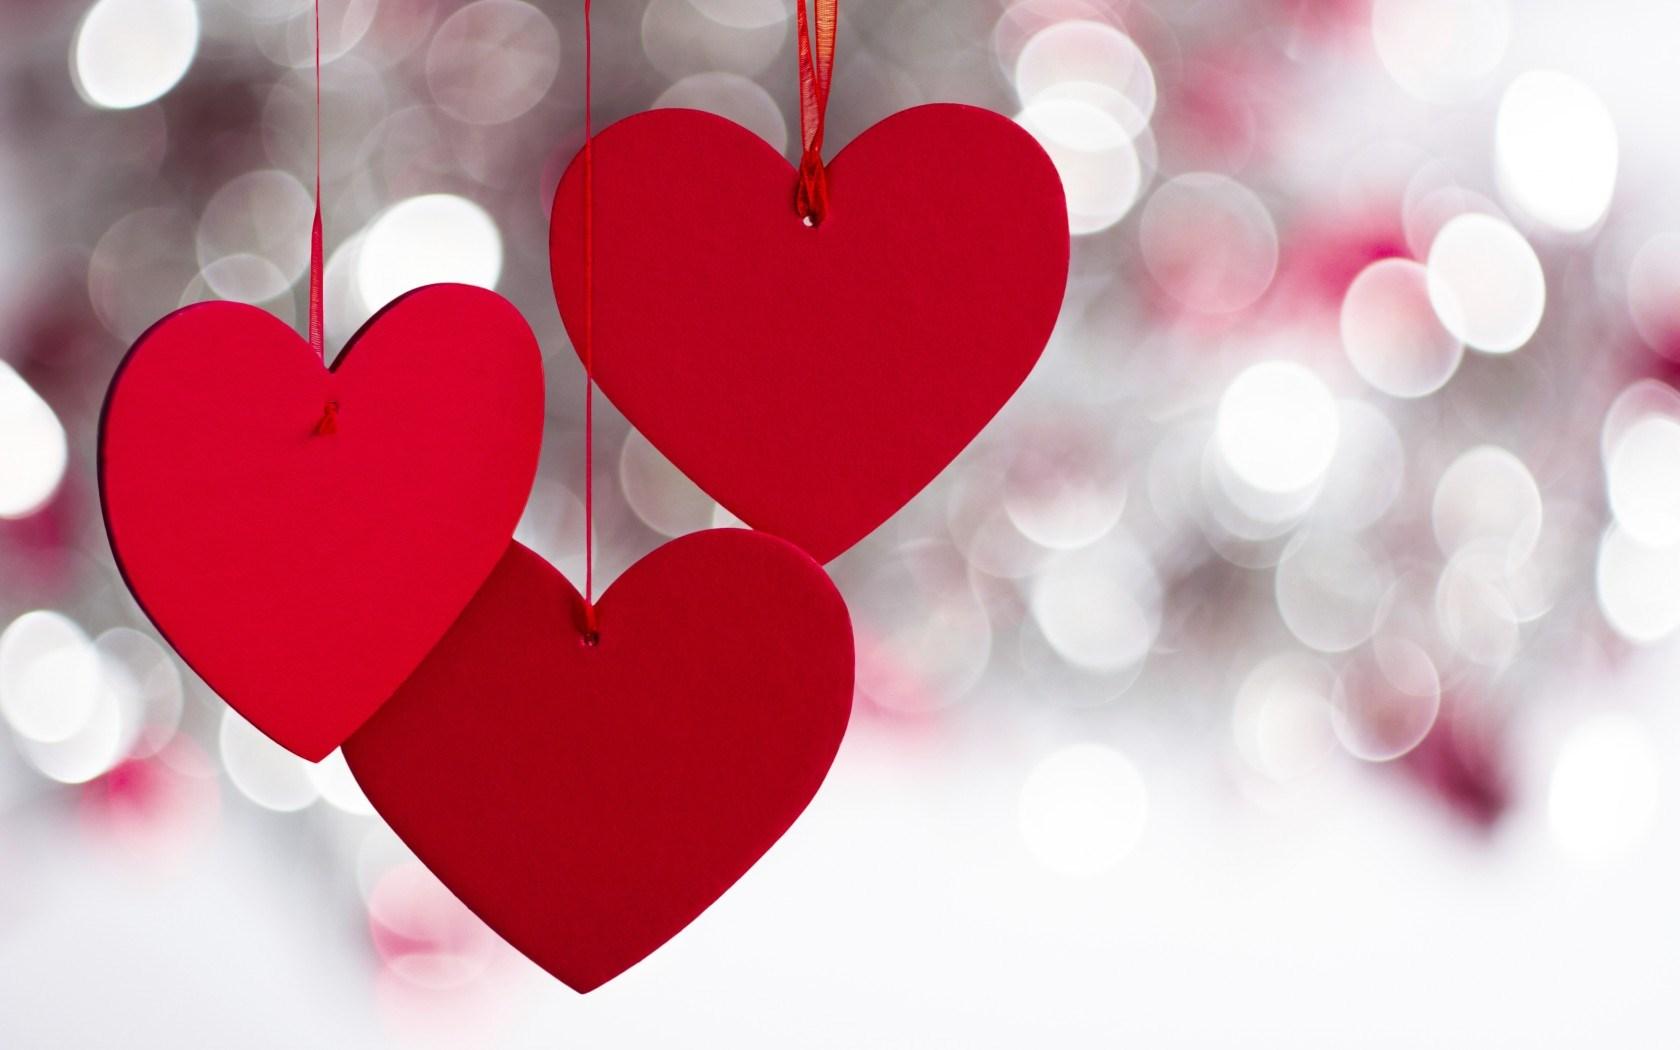 Hd Heart Wallpaper